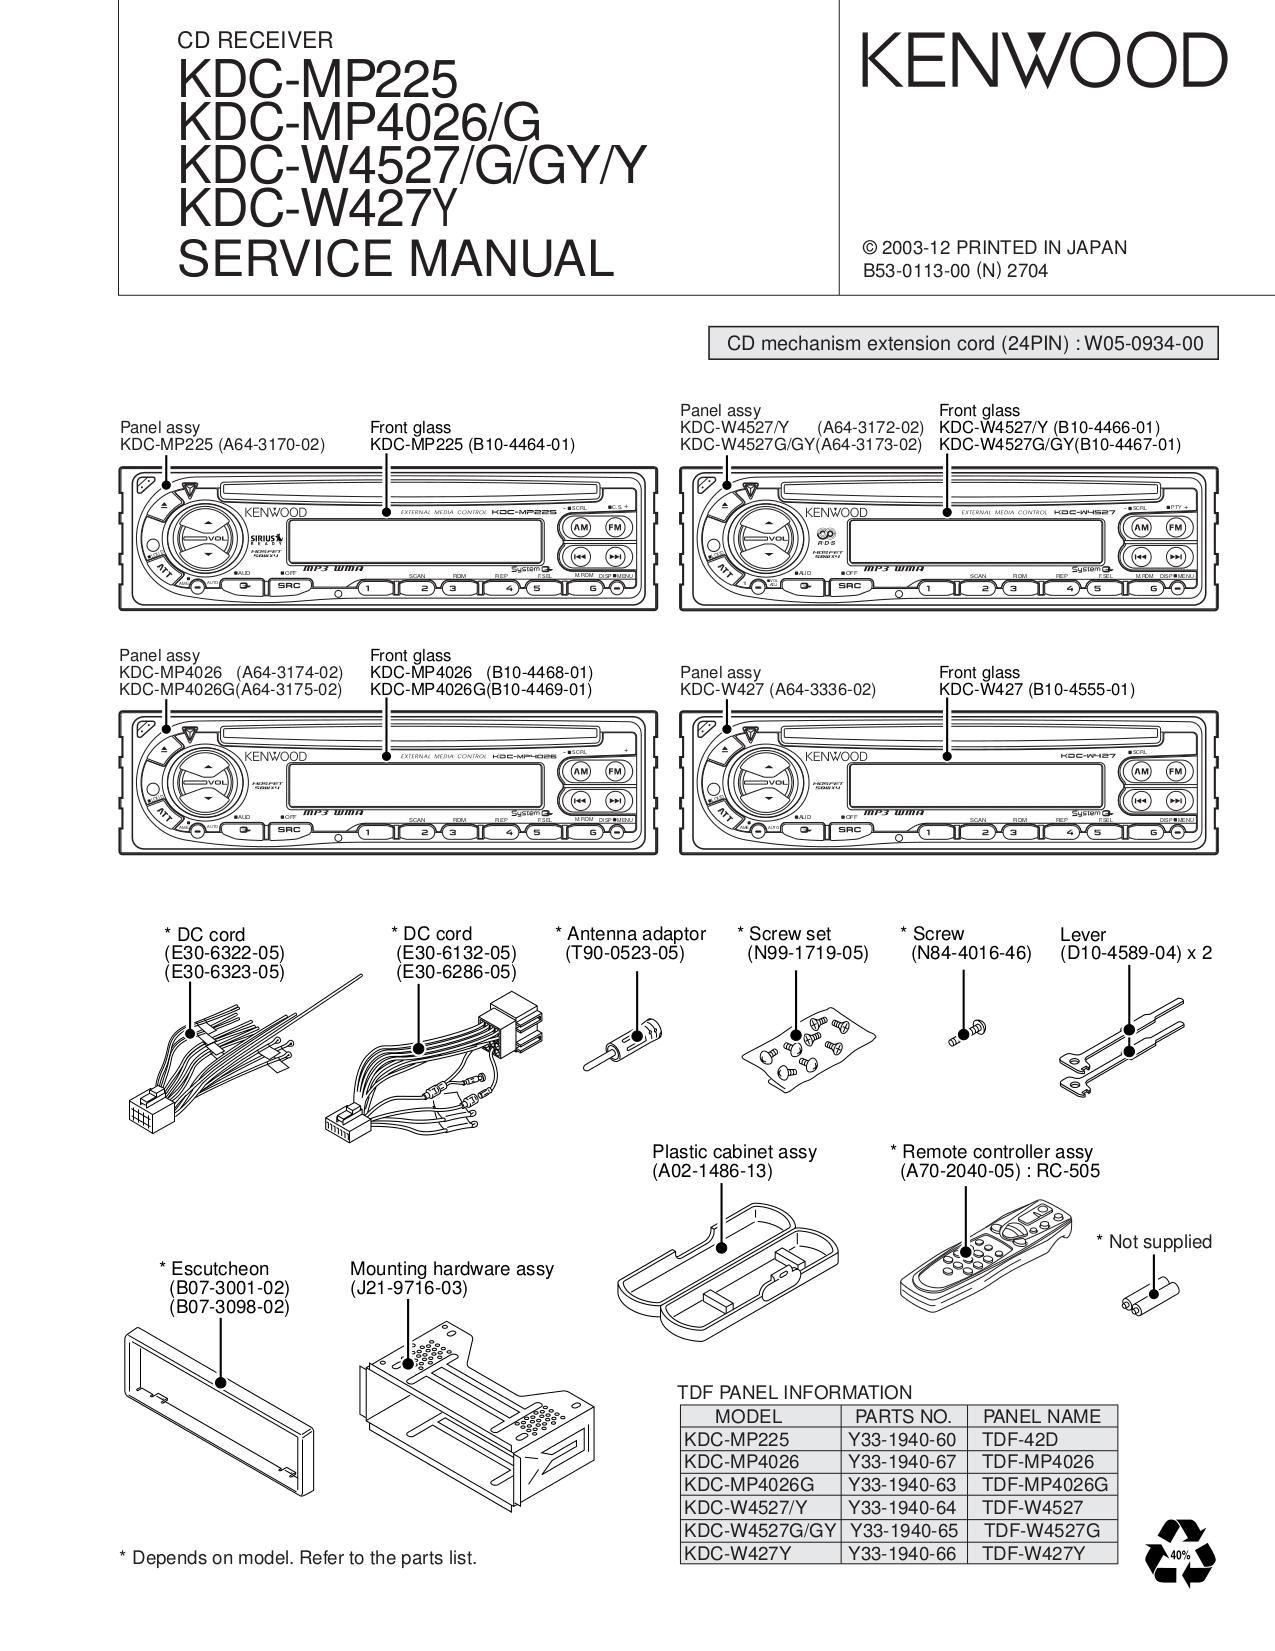 Kenwood Dpx500bt Wiring Diagram on